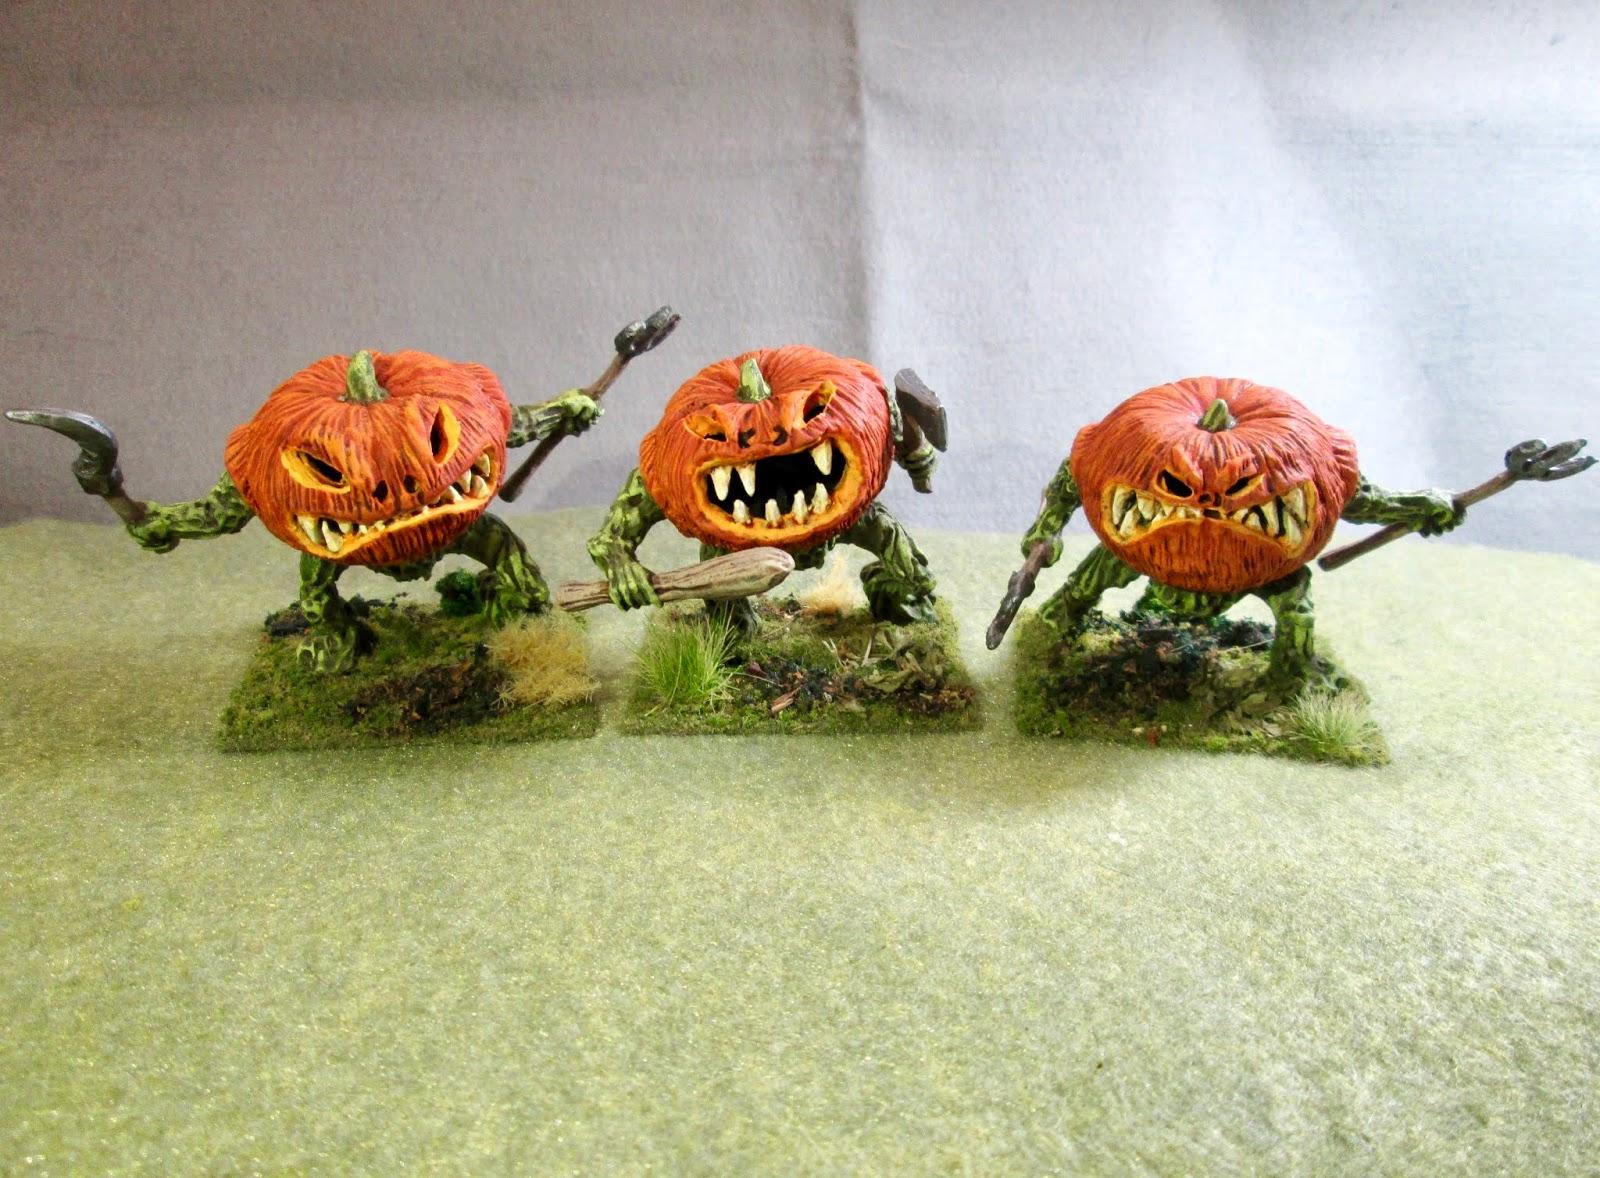 Painted Great Pumpkin Heads